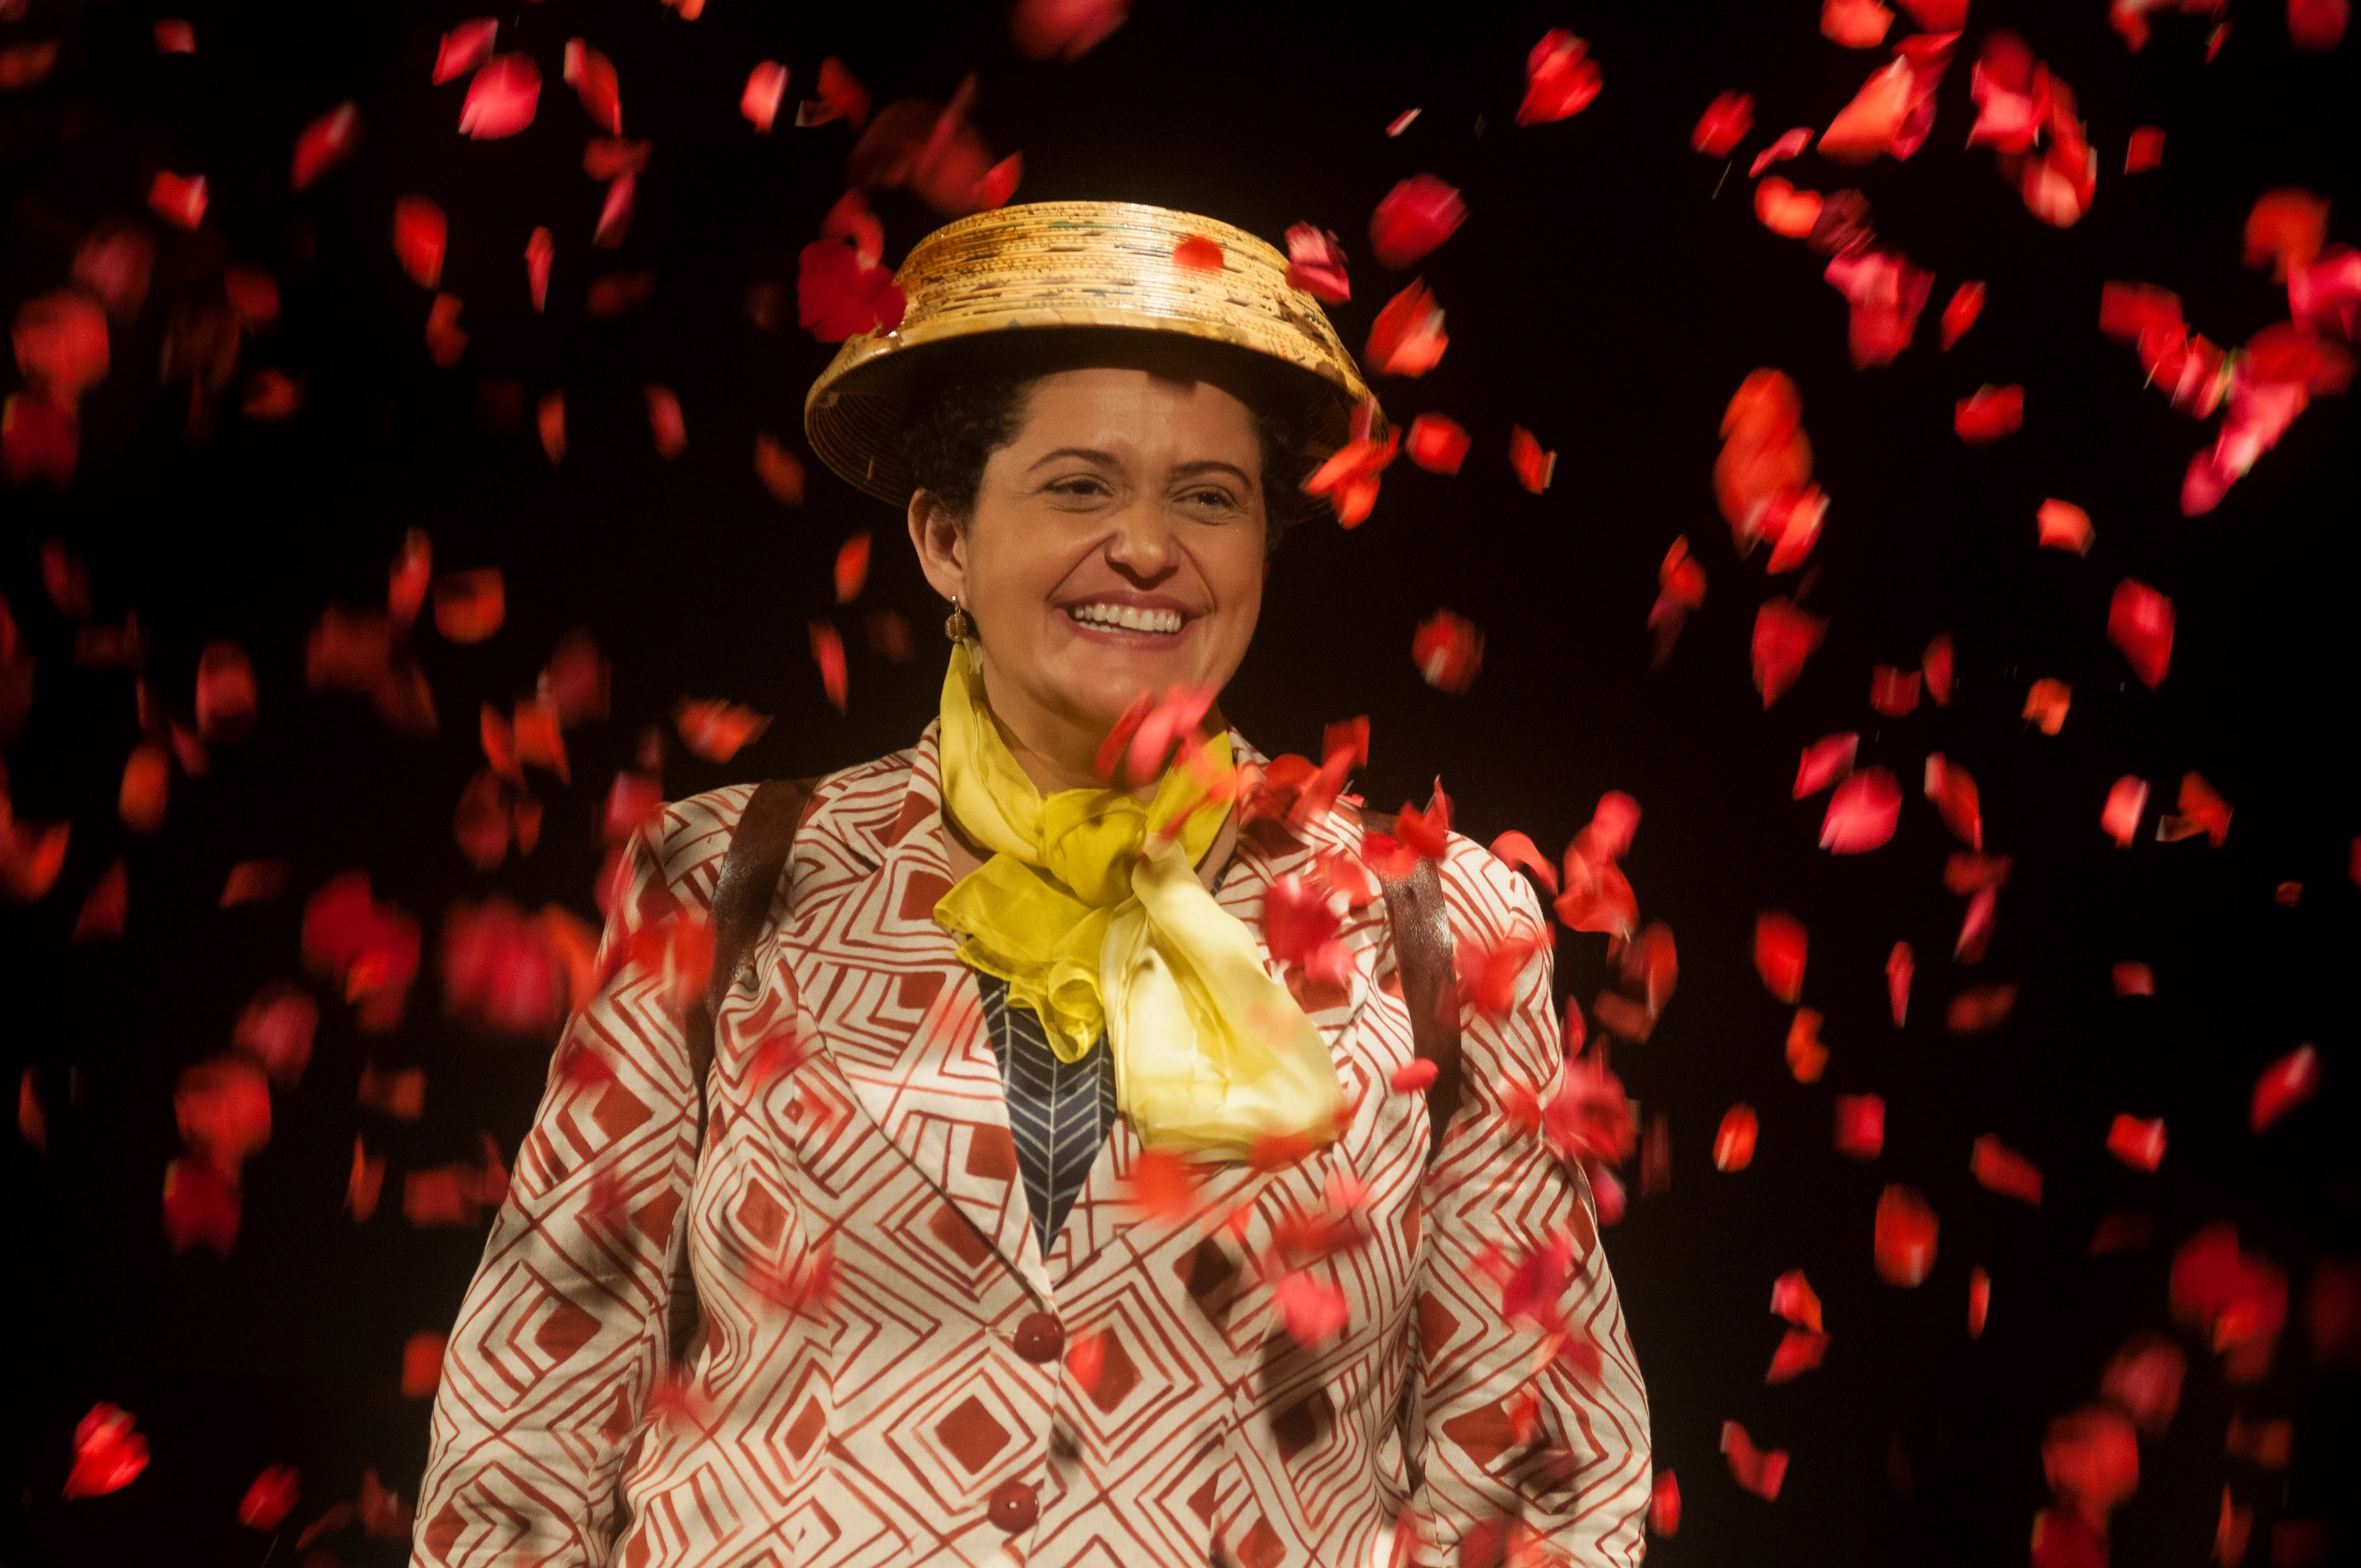 'Zilda Arns – A dona dos lírios' volta ao cartaz em 3 de dezembro no Rio